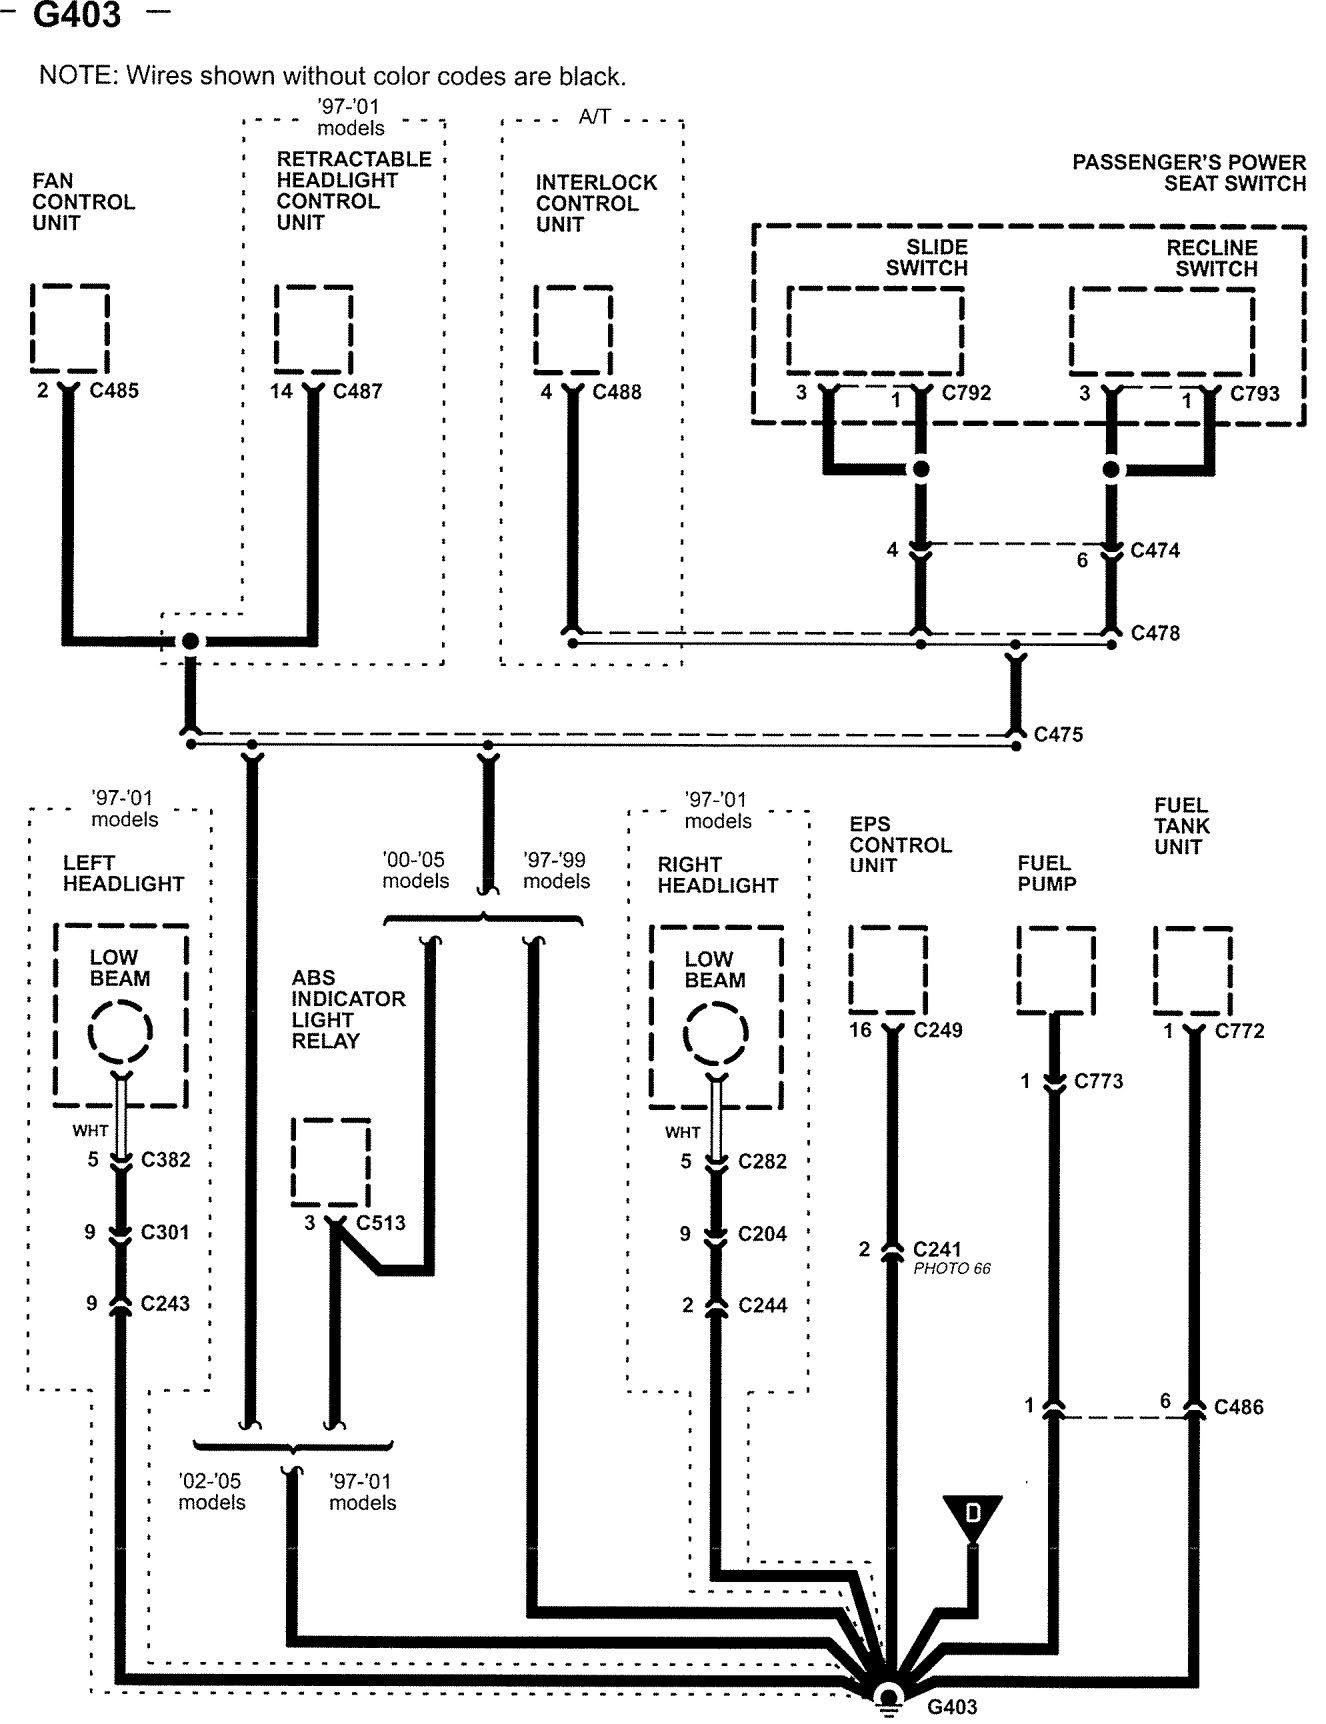 2005 Acura Mdx Fuse Box Diagram